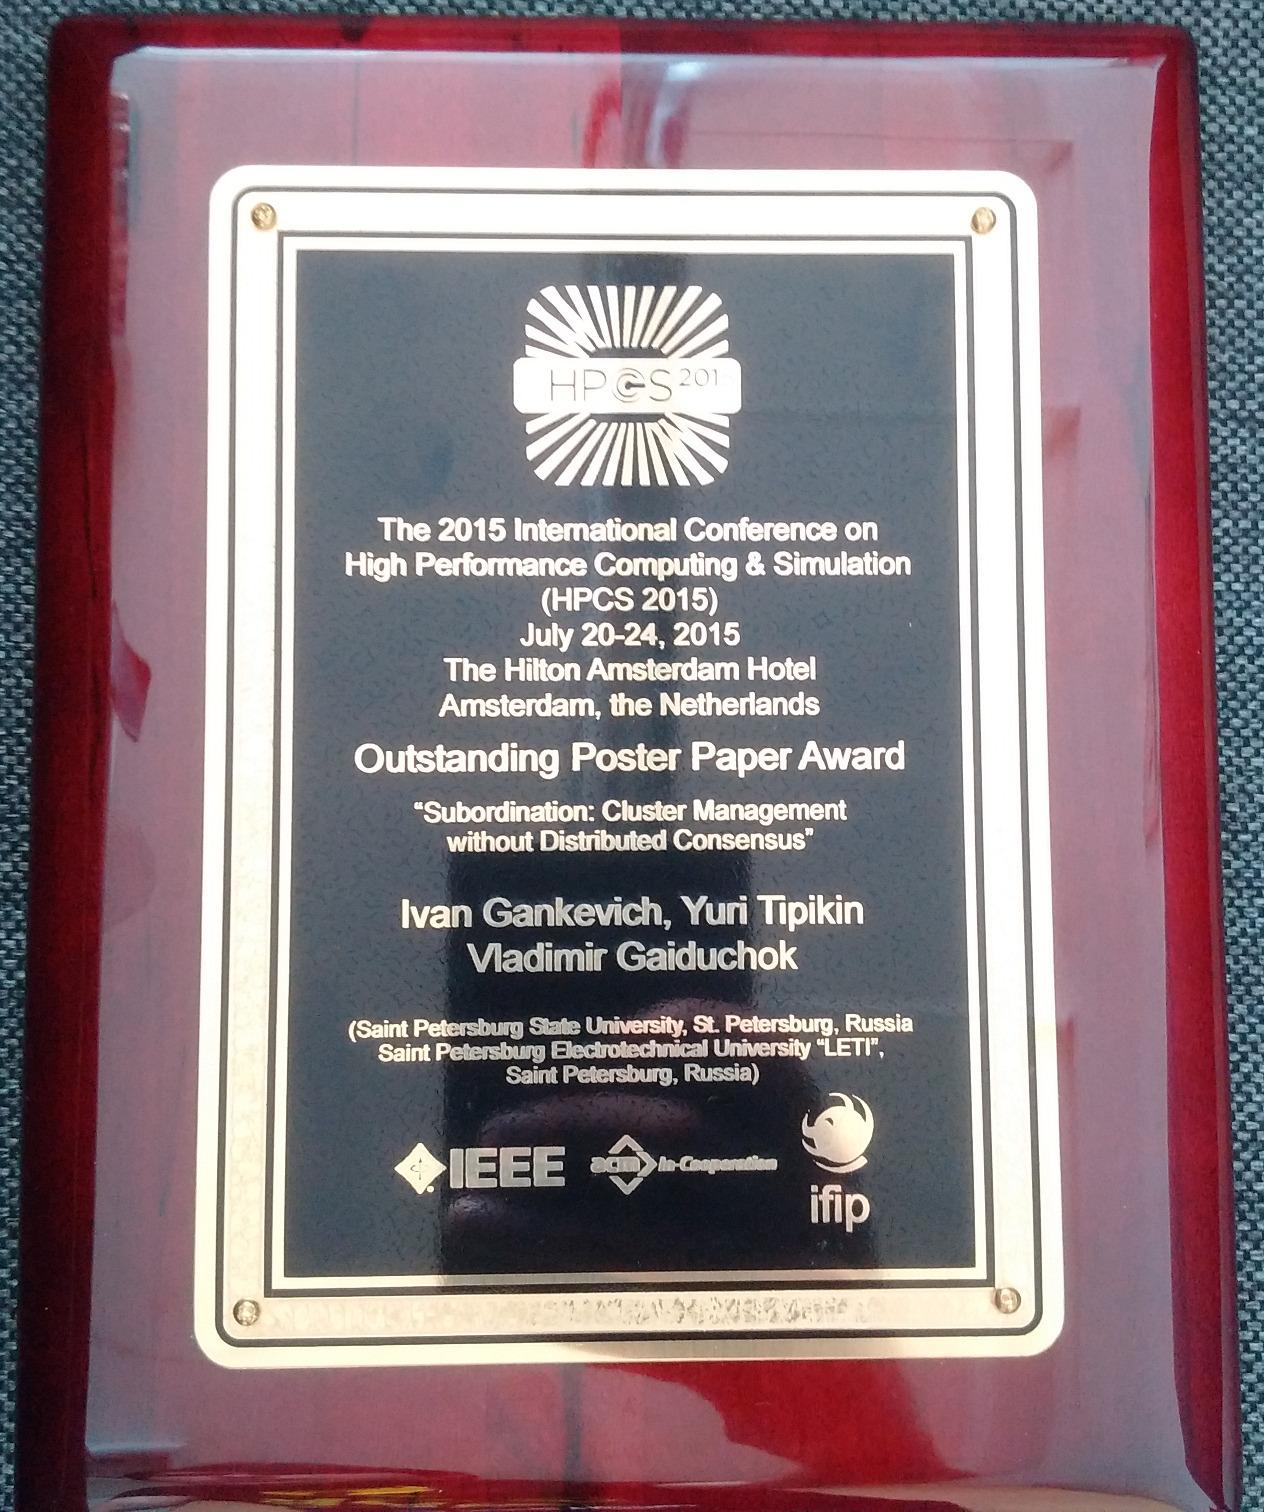 HPCS'15  Outstanding Poster Paper Award — Saint Petersburg State